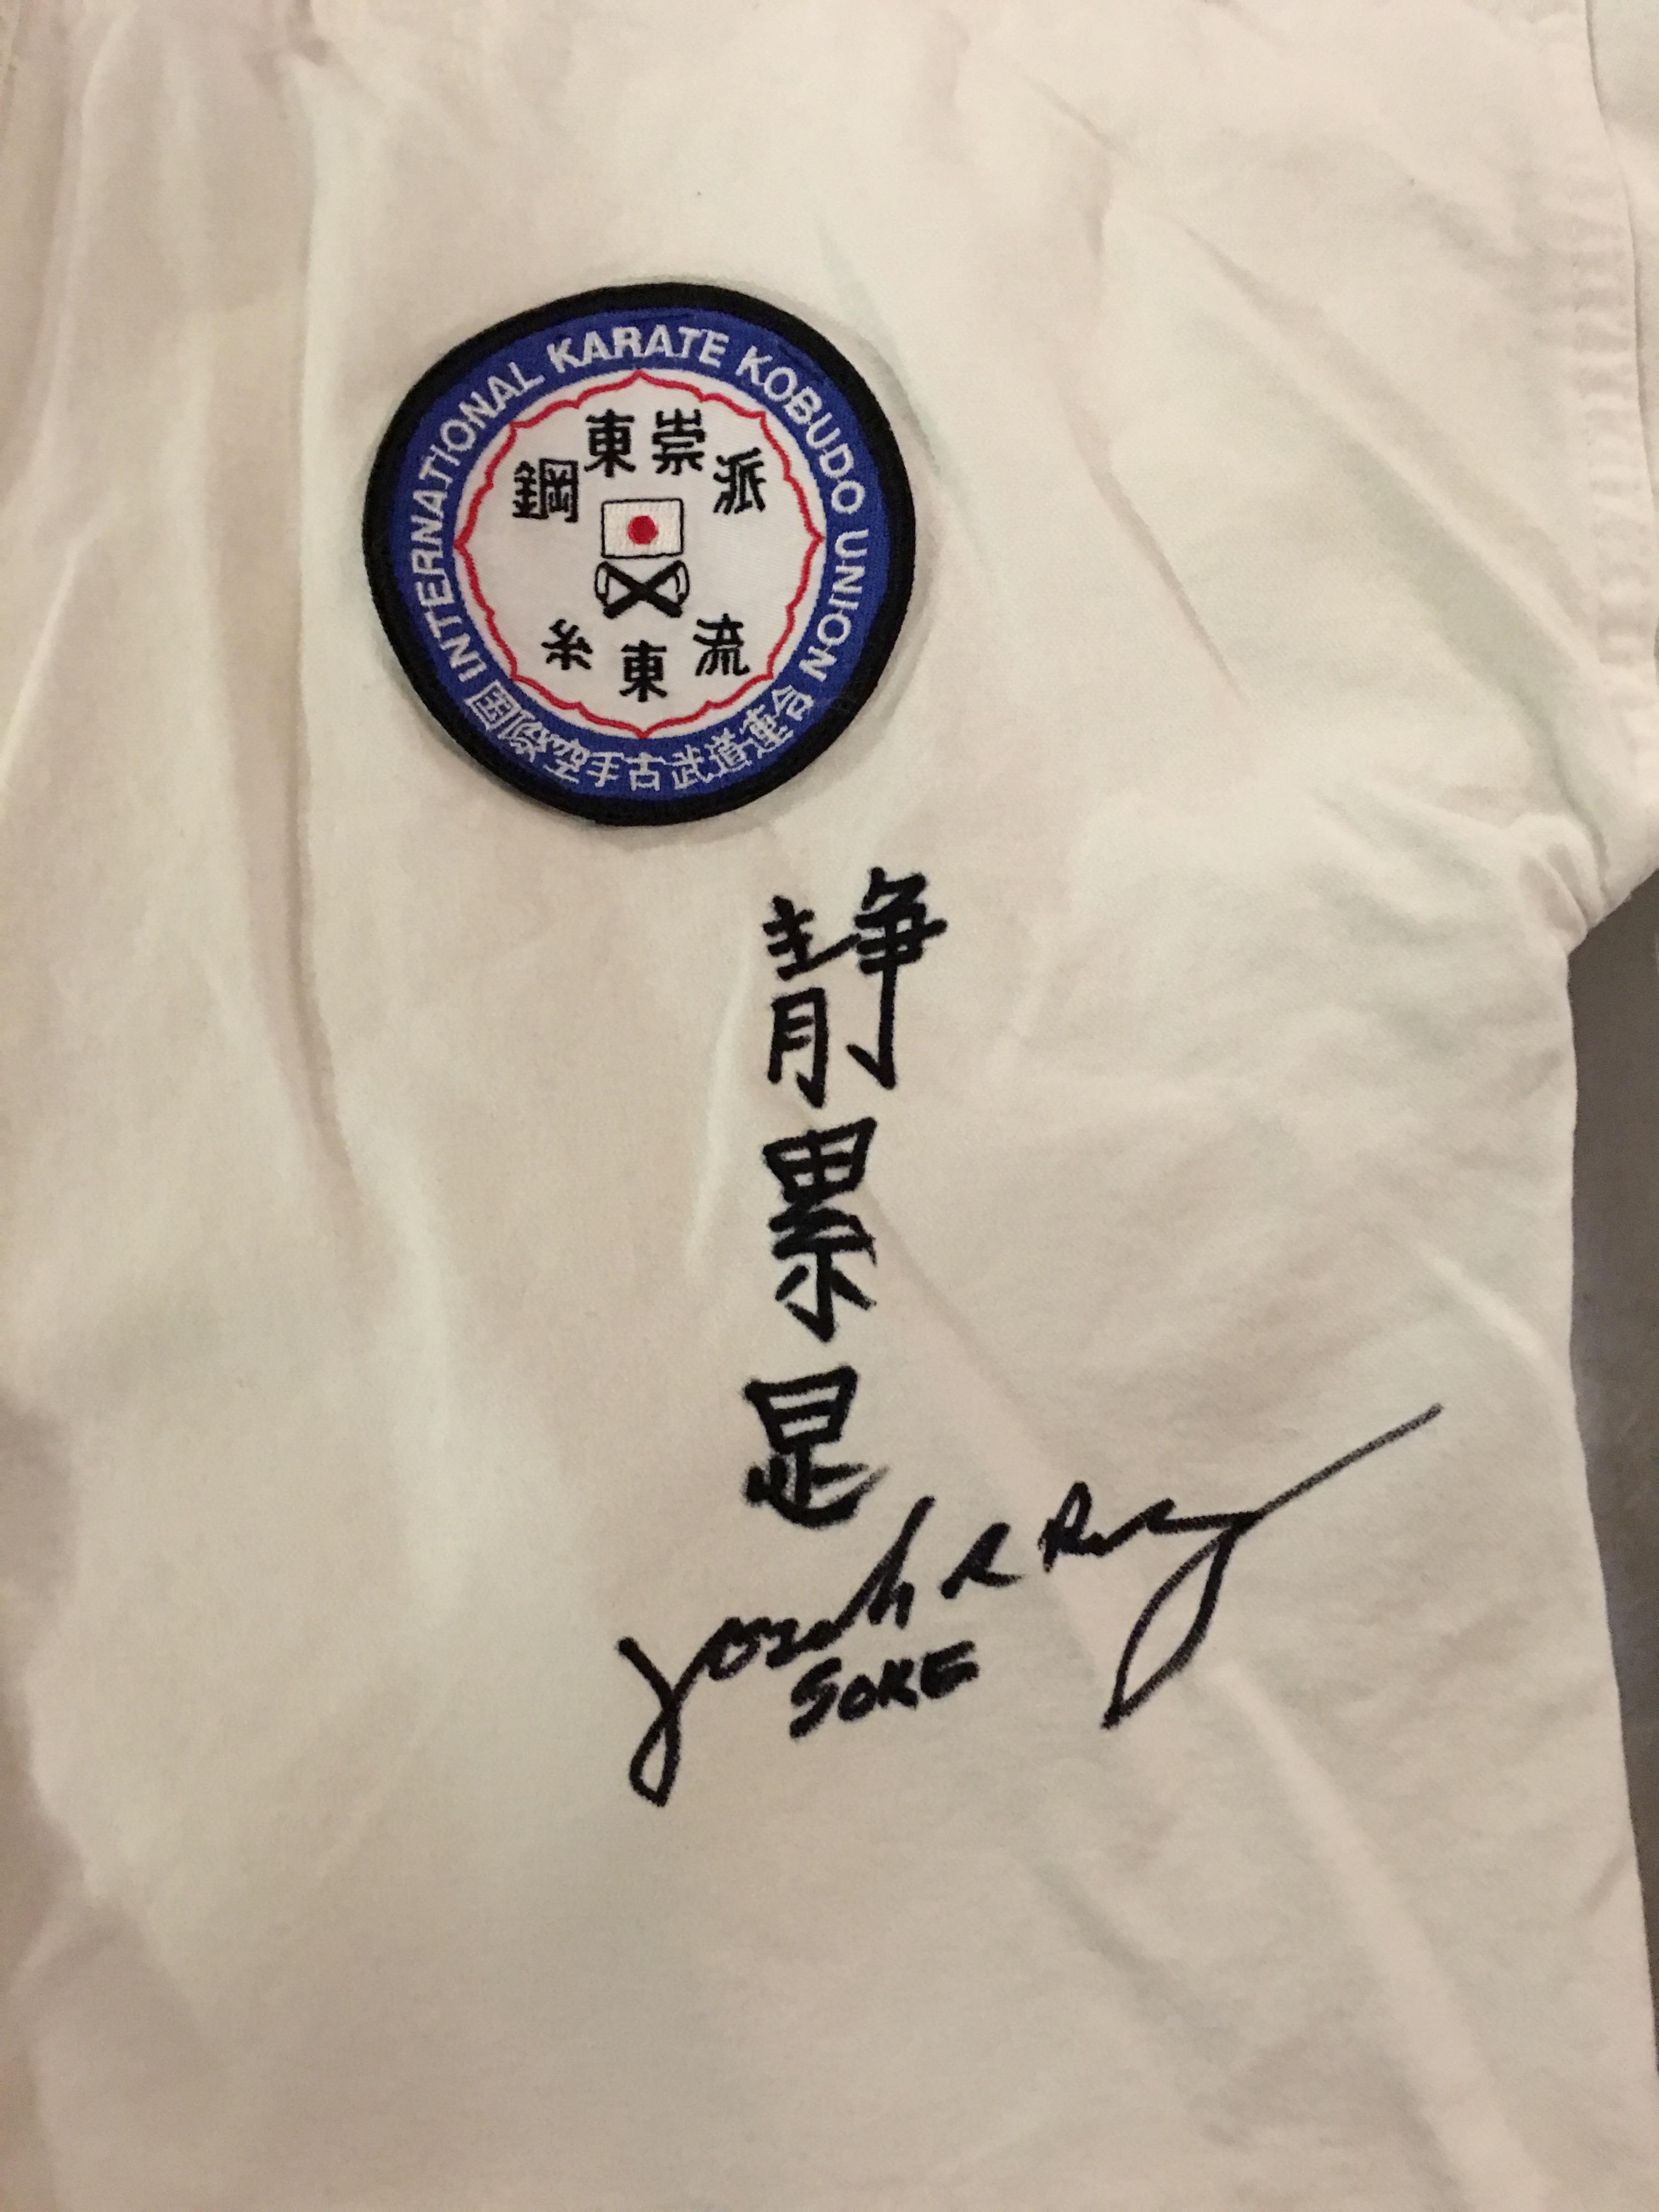 Soke Joseph Ruiz Autographed Gi